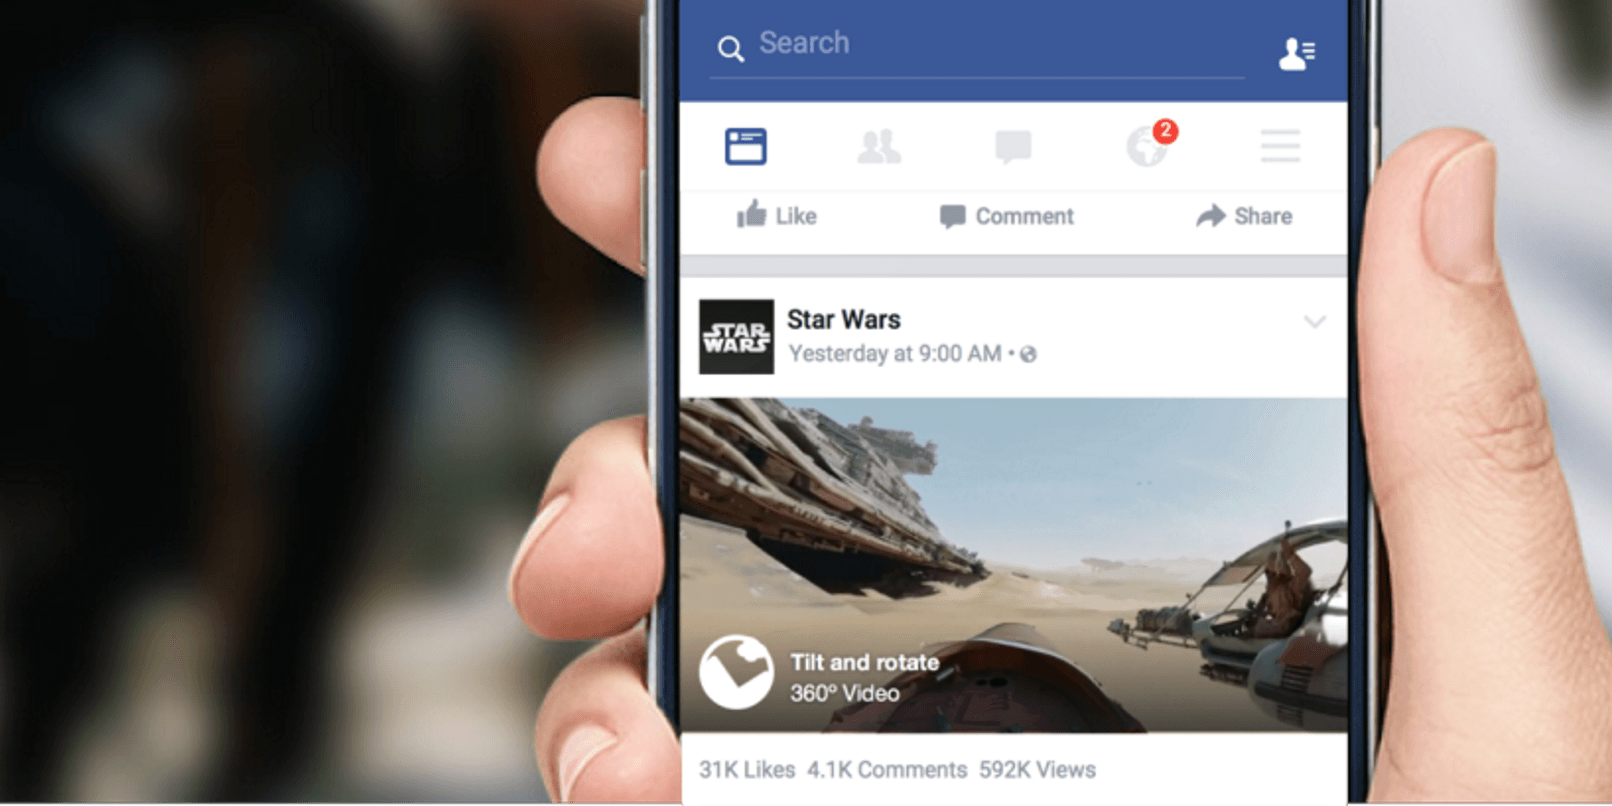 360 grados videos-in-news-feed